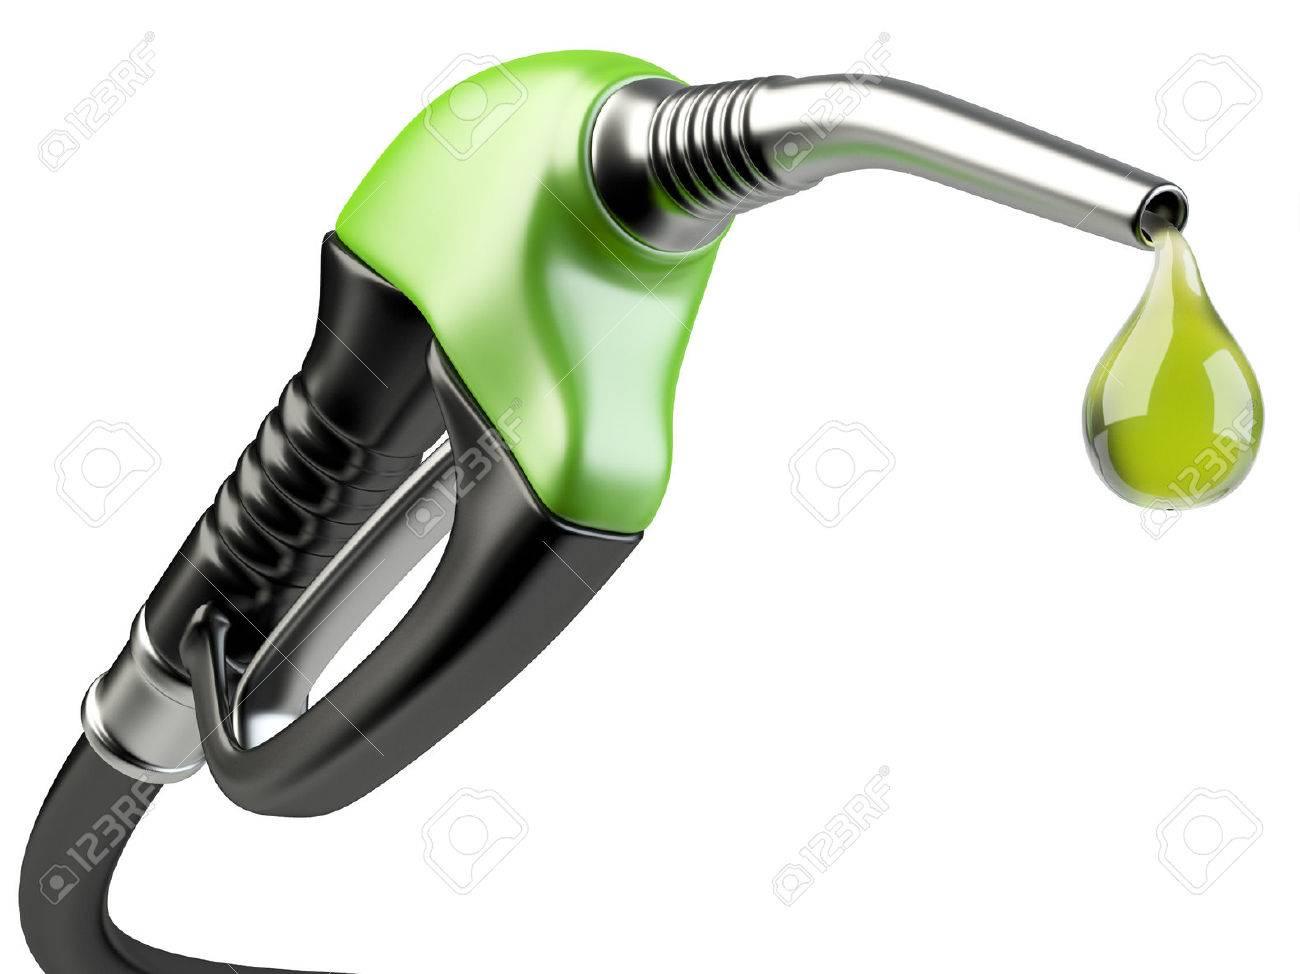 Green fuel pump nozzle with drop oil. Bio fuel concept. - 37652505